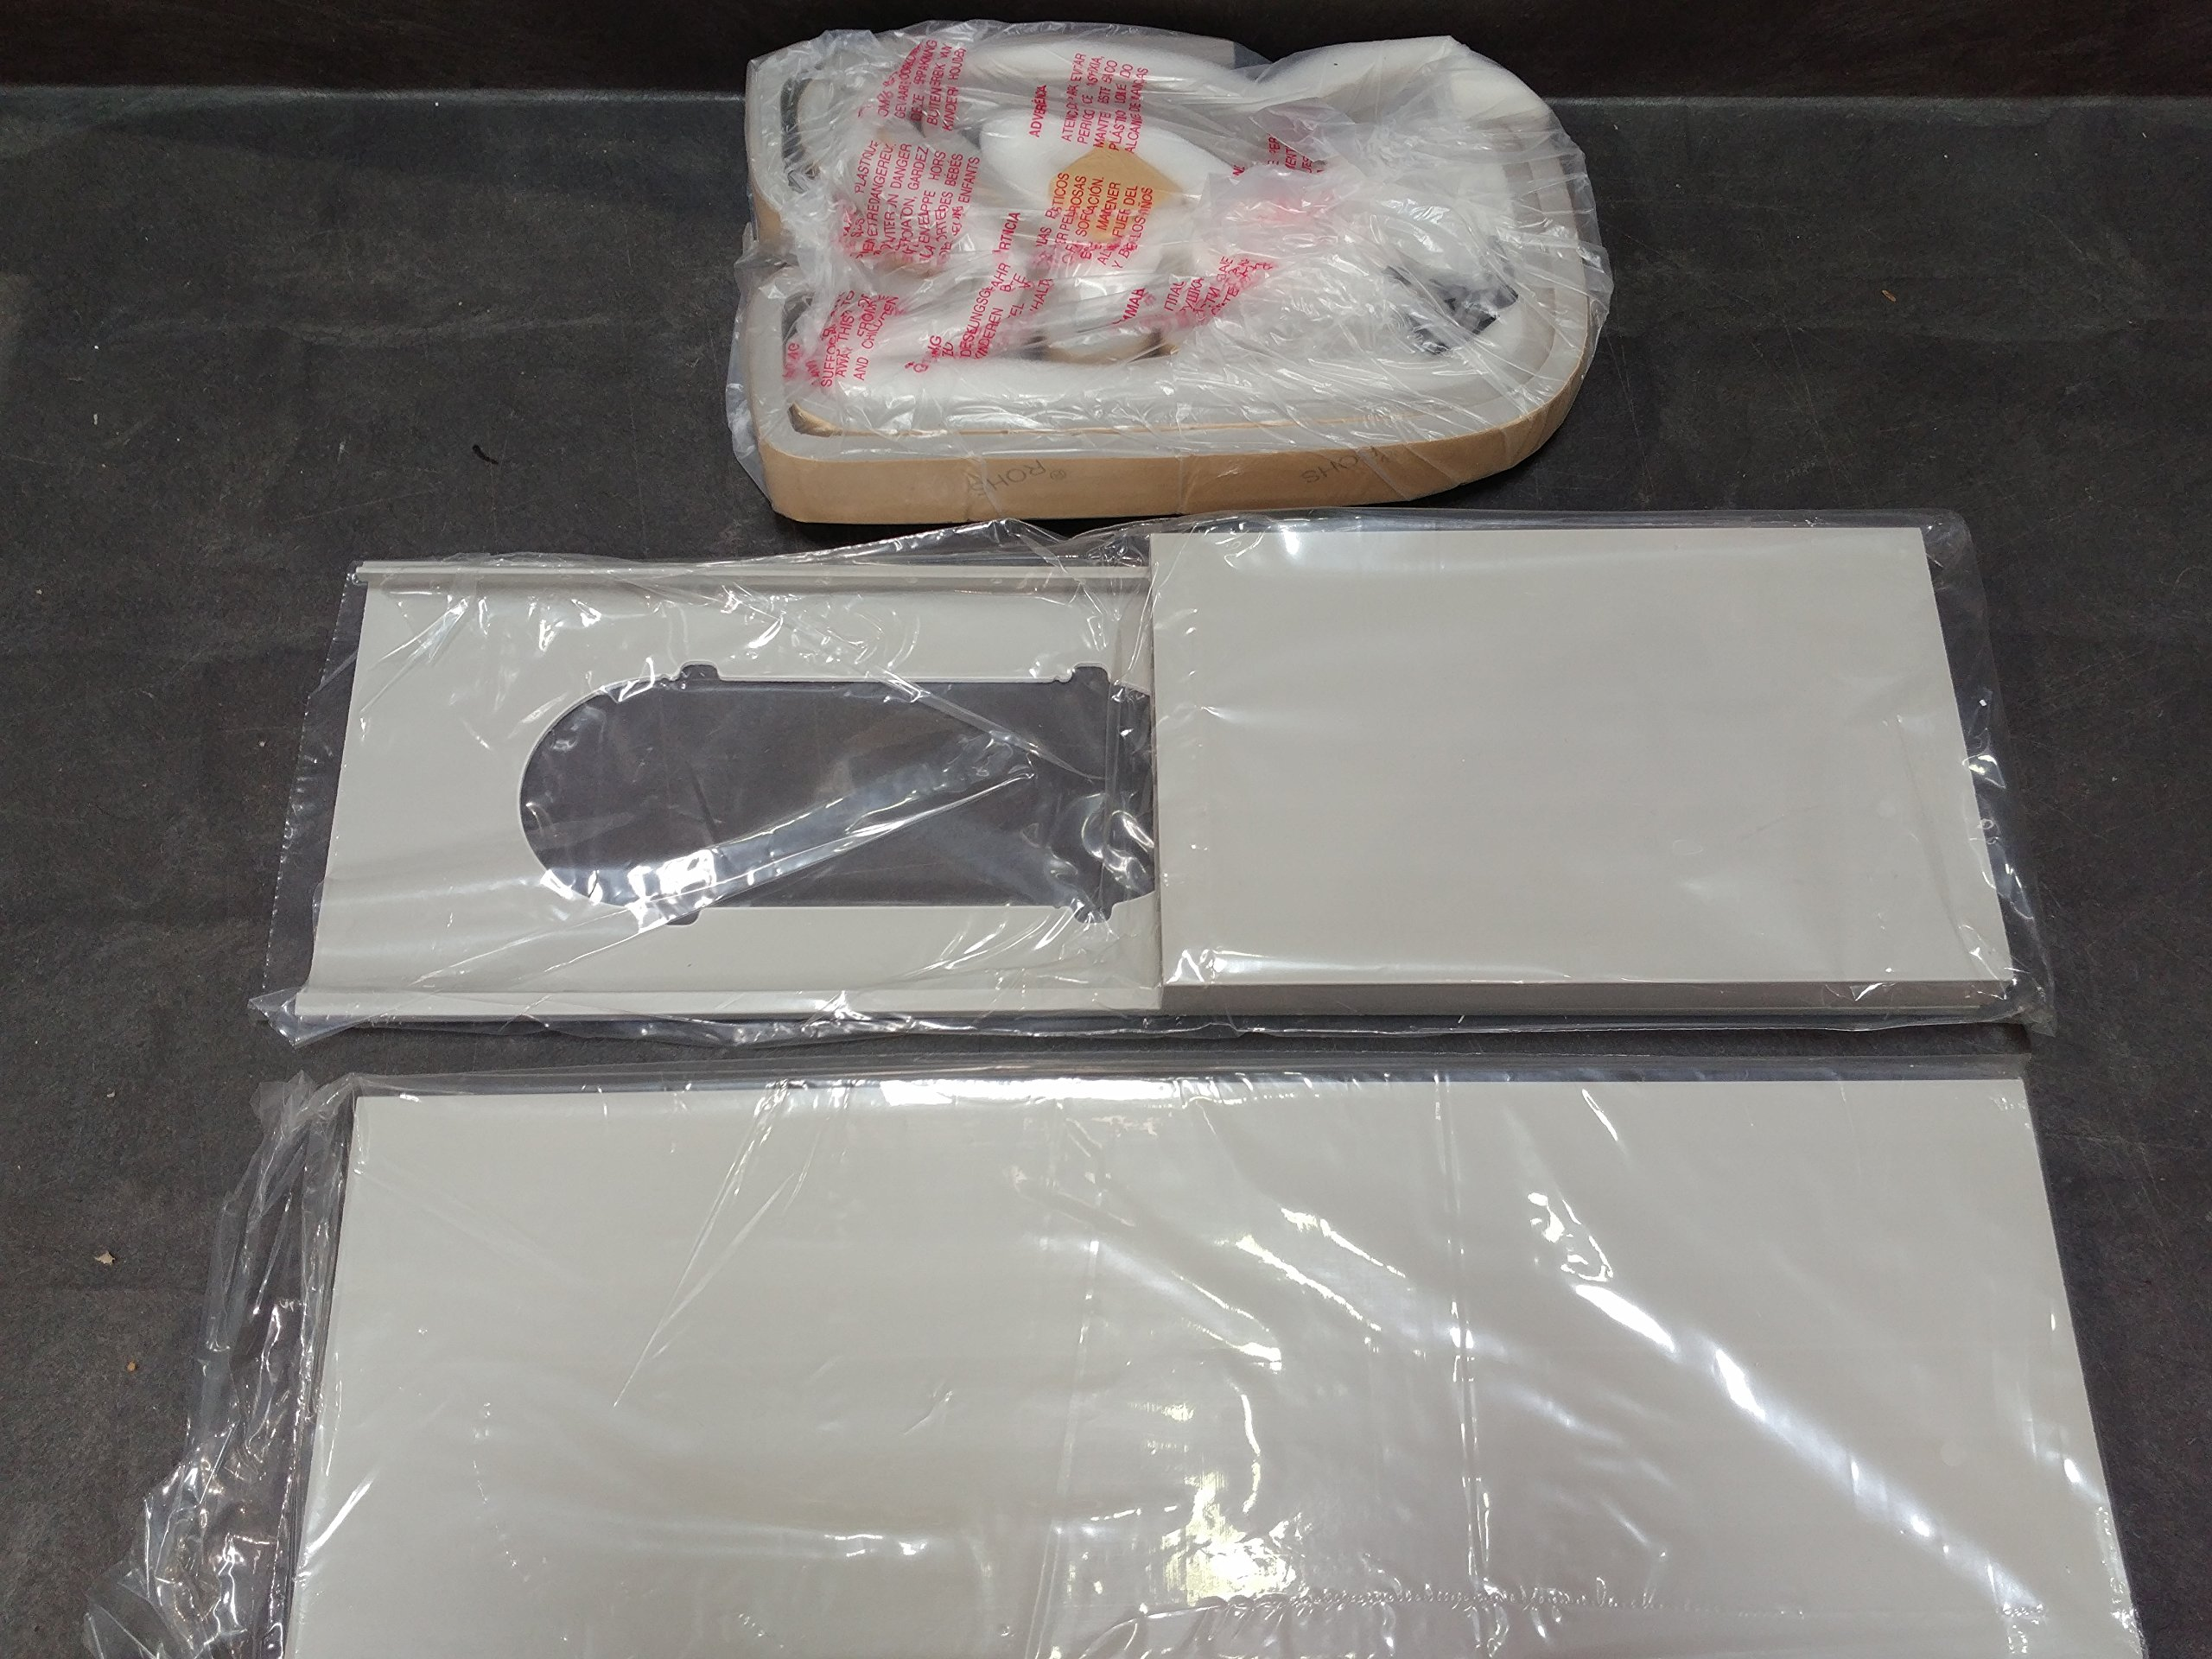 Lg Electronics COV30314909 Room Air Conditioner Window Panel Kit Genuine Original Equipment Manufacturer (OEM) Part